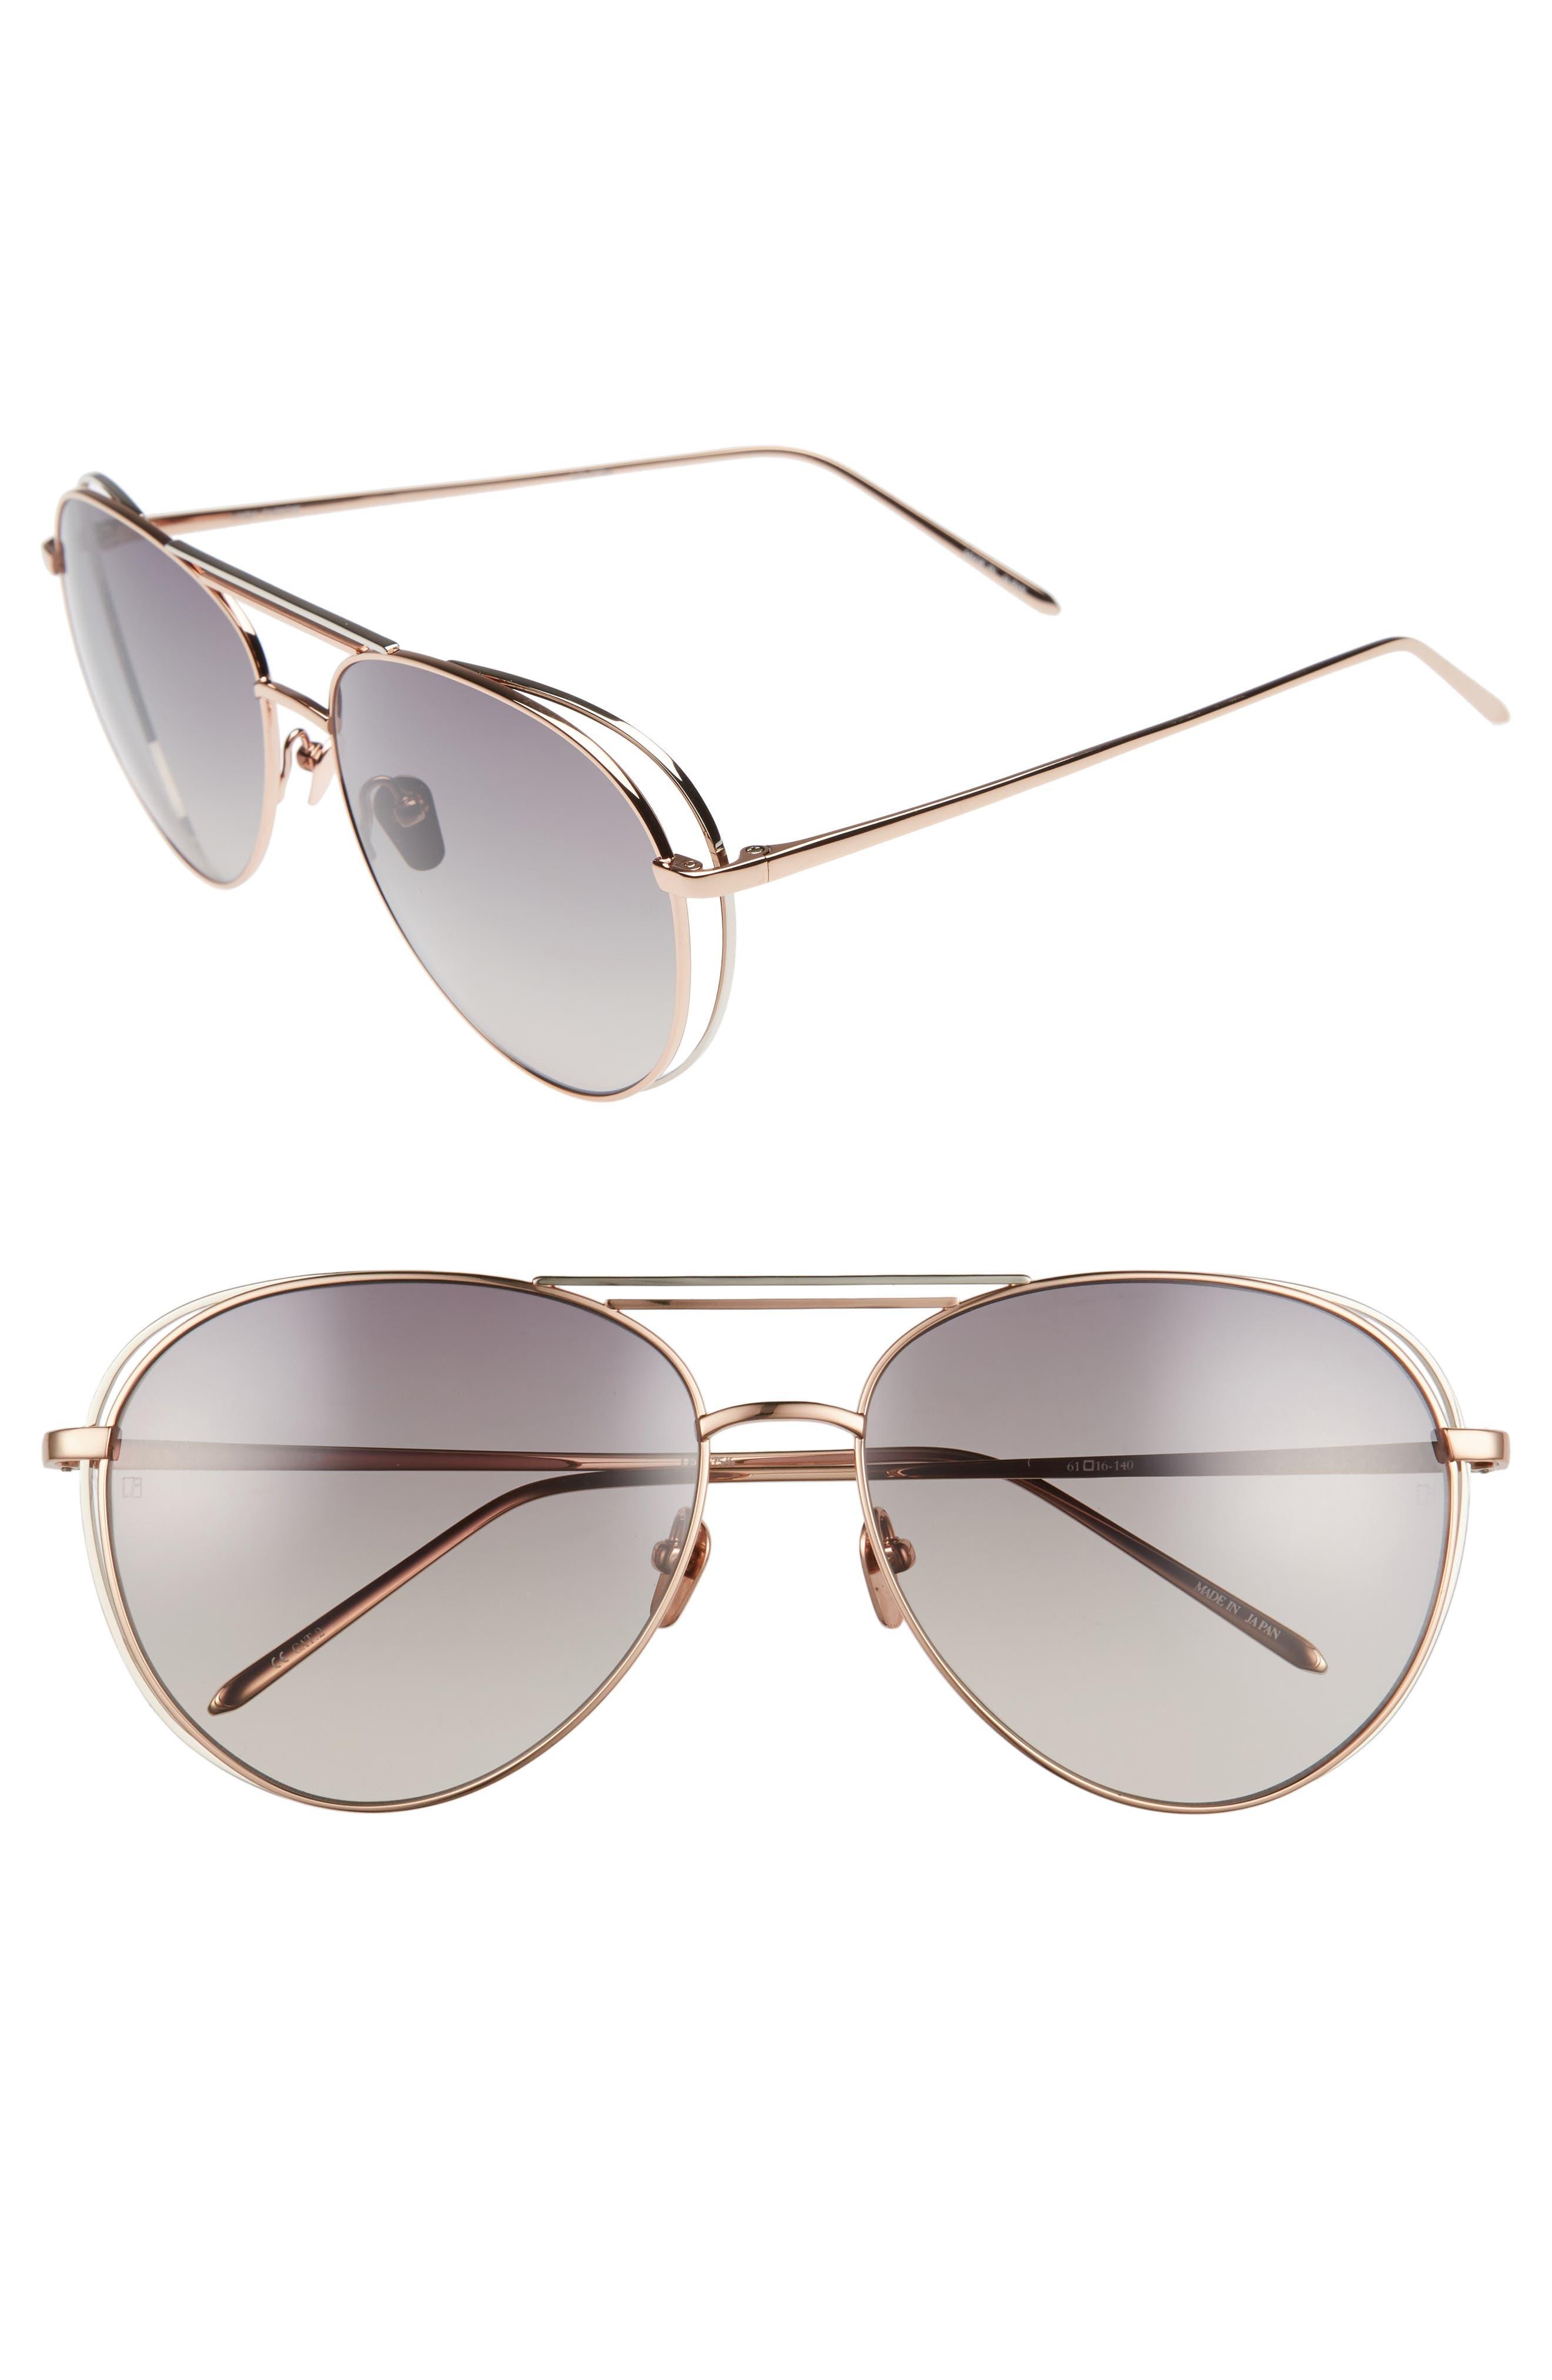 61mm 18 Karat Gold Aviator Sunglasses,                             Main thumbnail 1, color,                             Rose Gold White Gold/ Grey